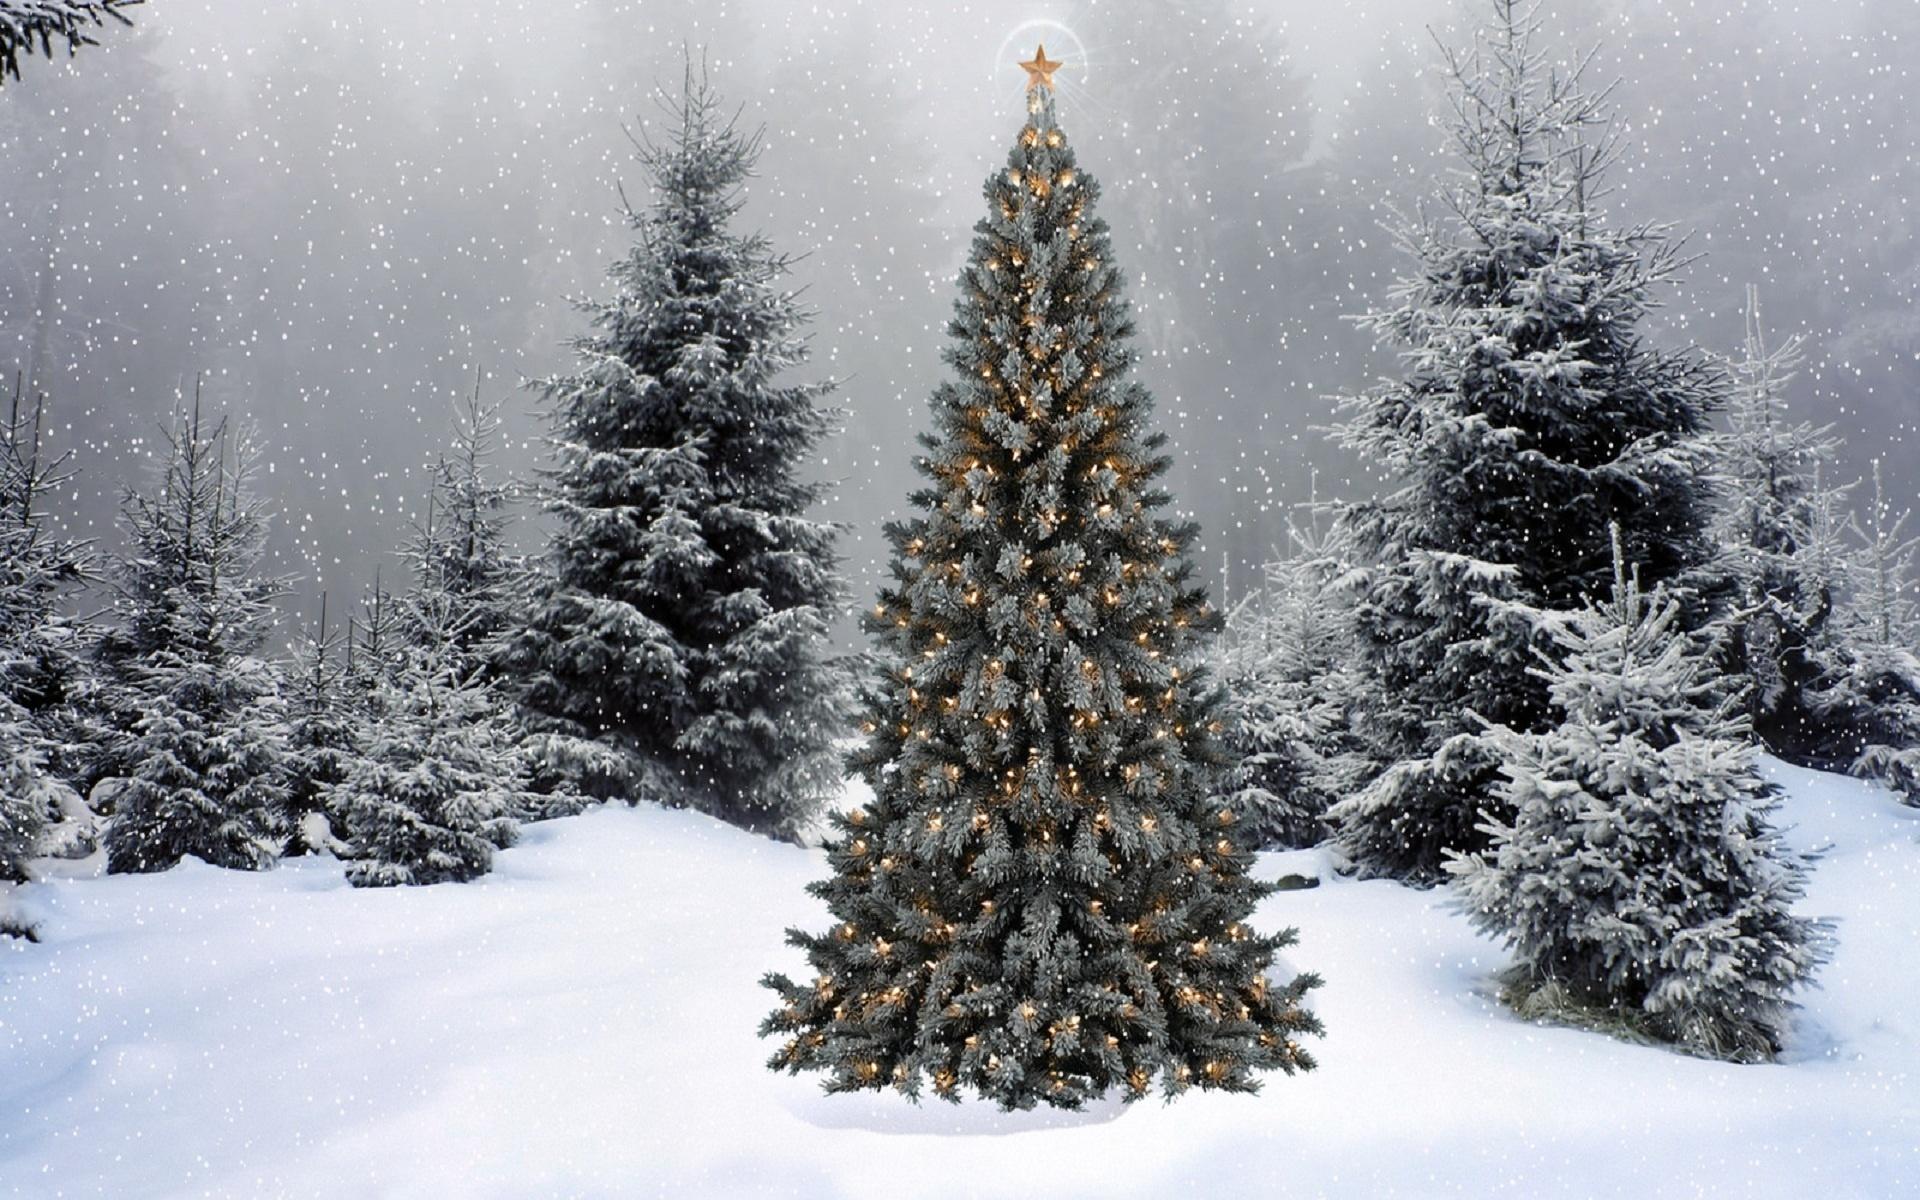 Картинками мая, картинки фото зима новый год